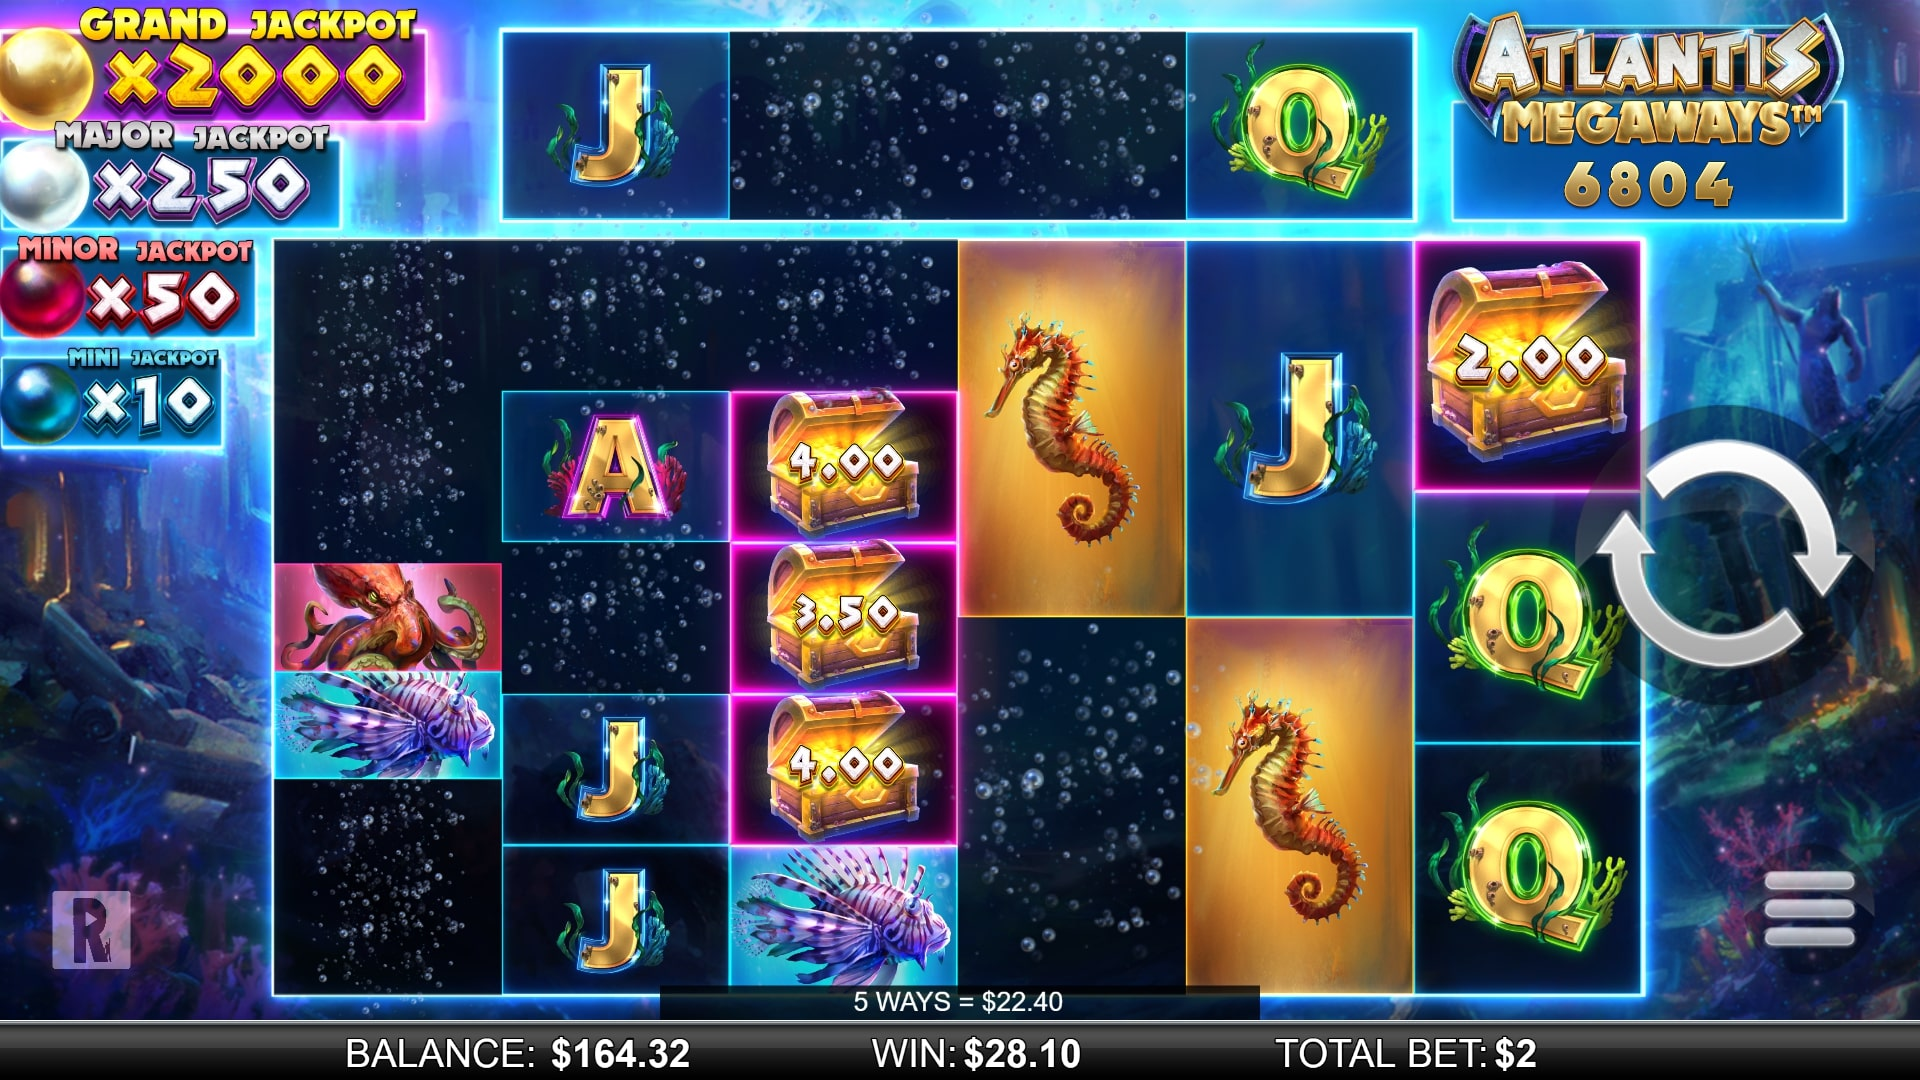 Atlantis Megaways Screenshot